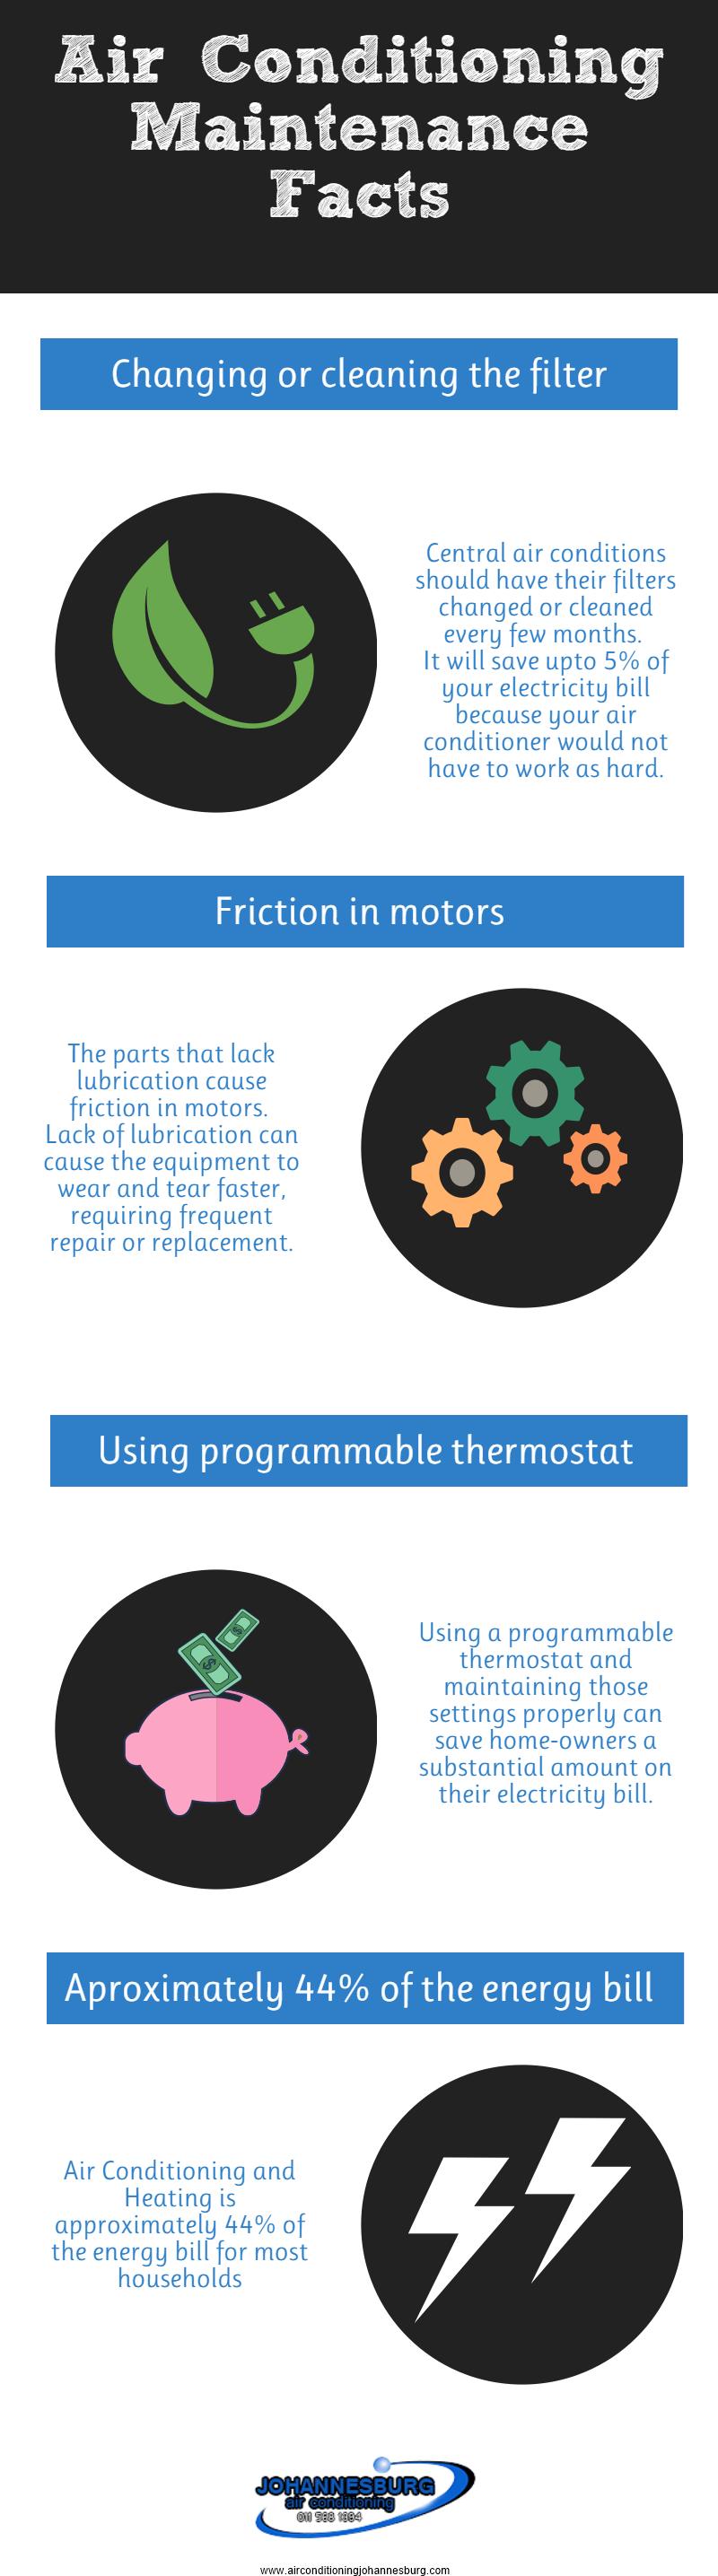 infographic-airconditioningjohannesburg-com